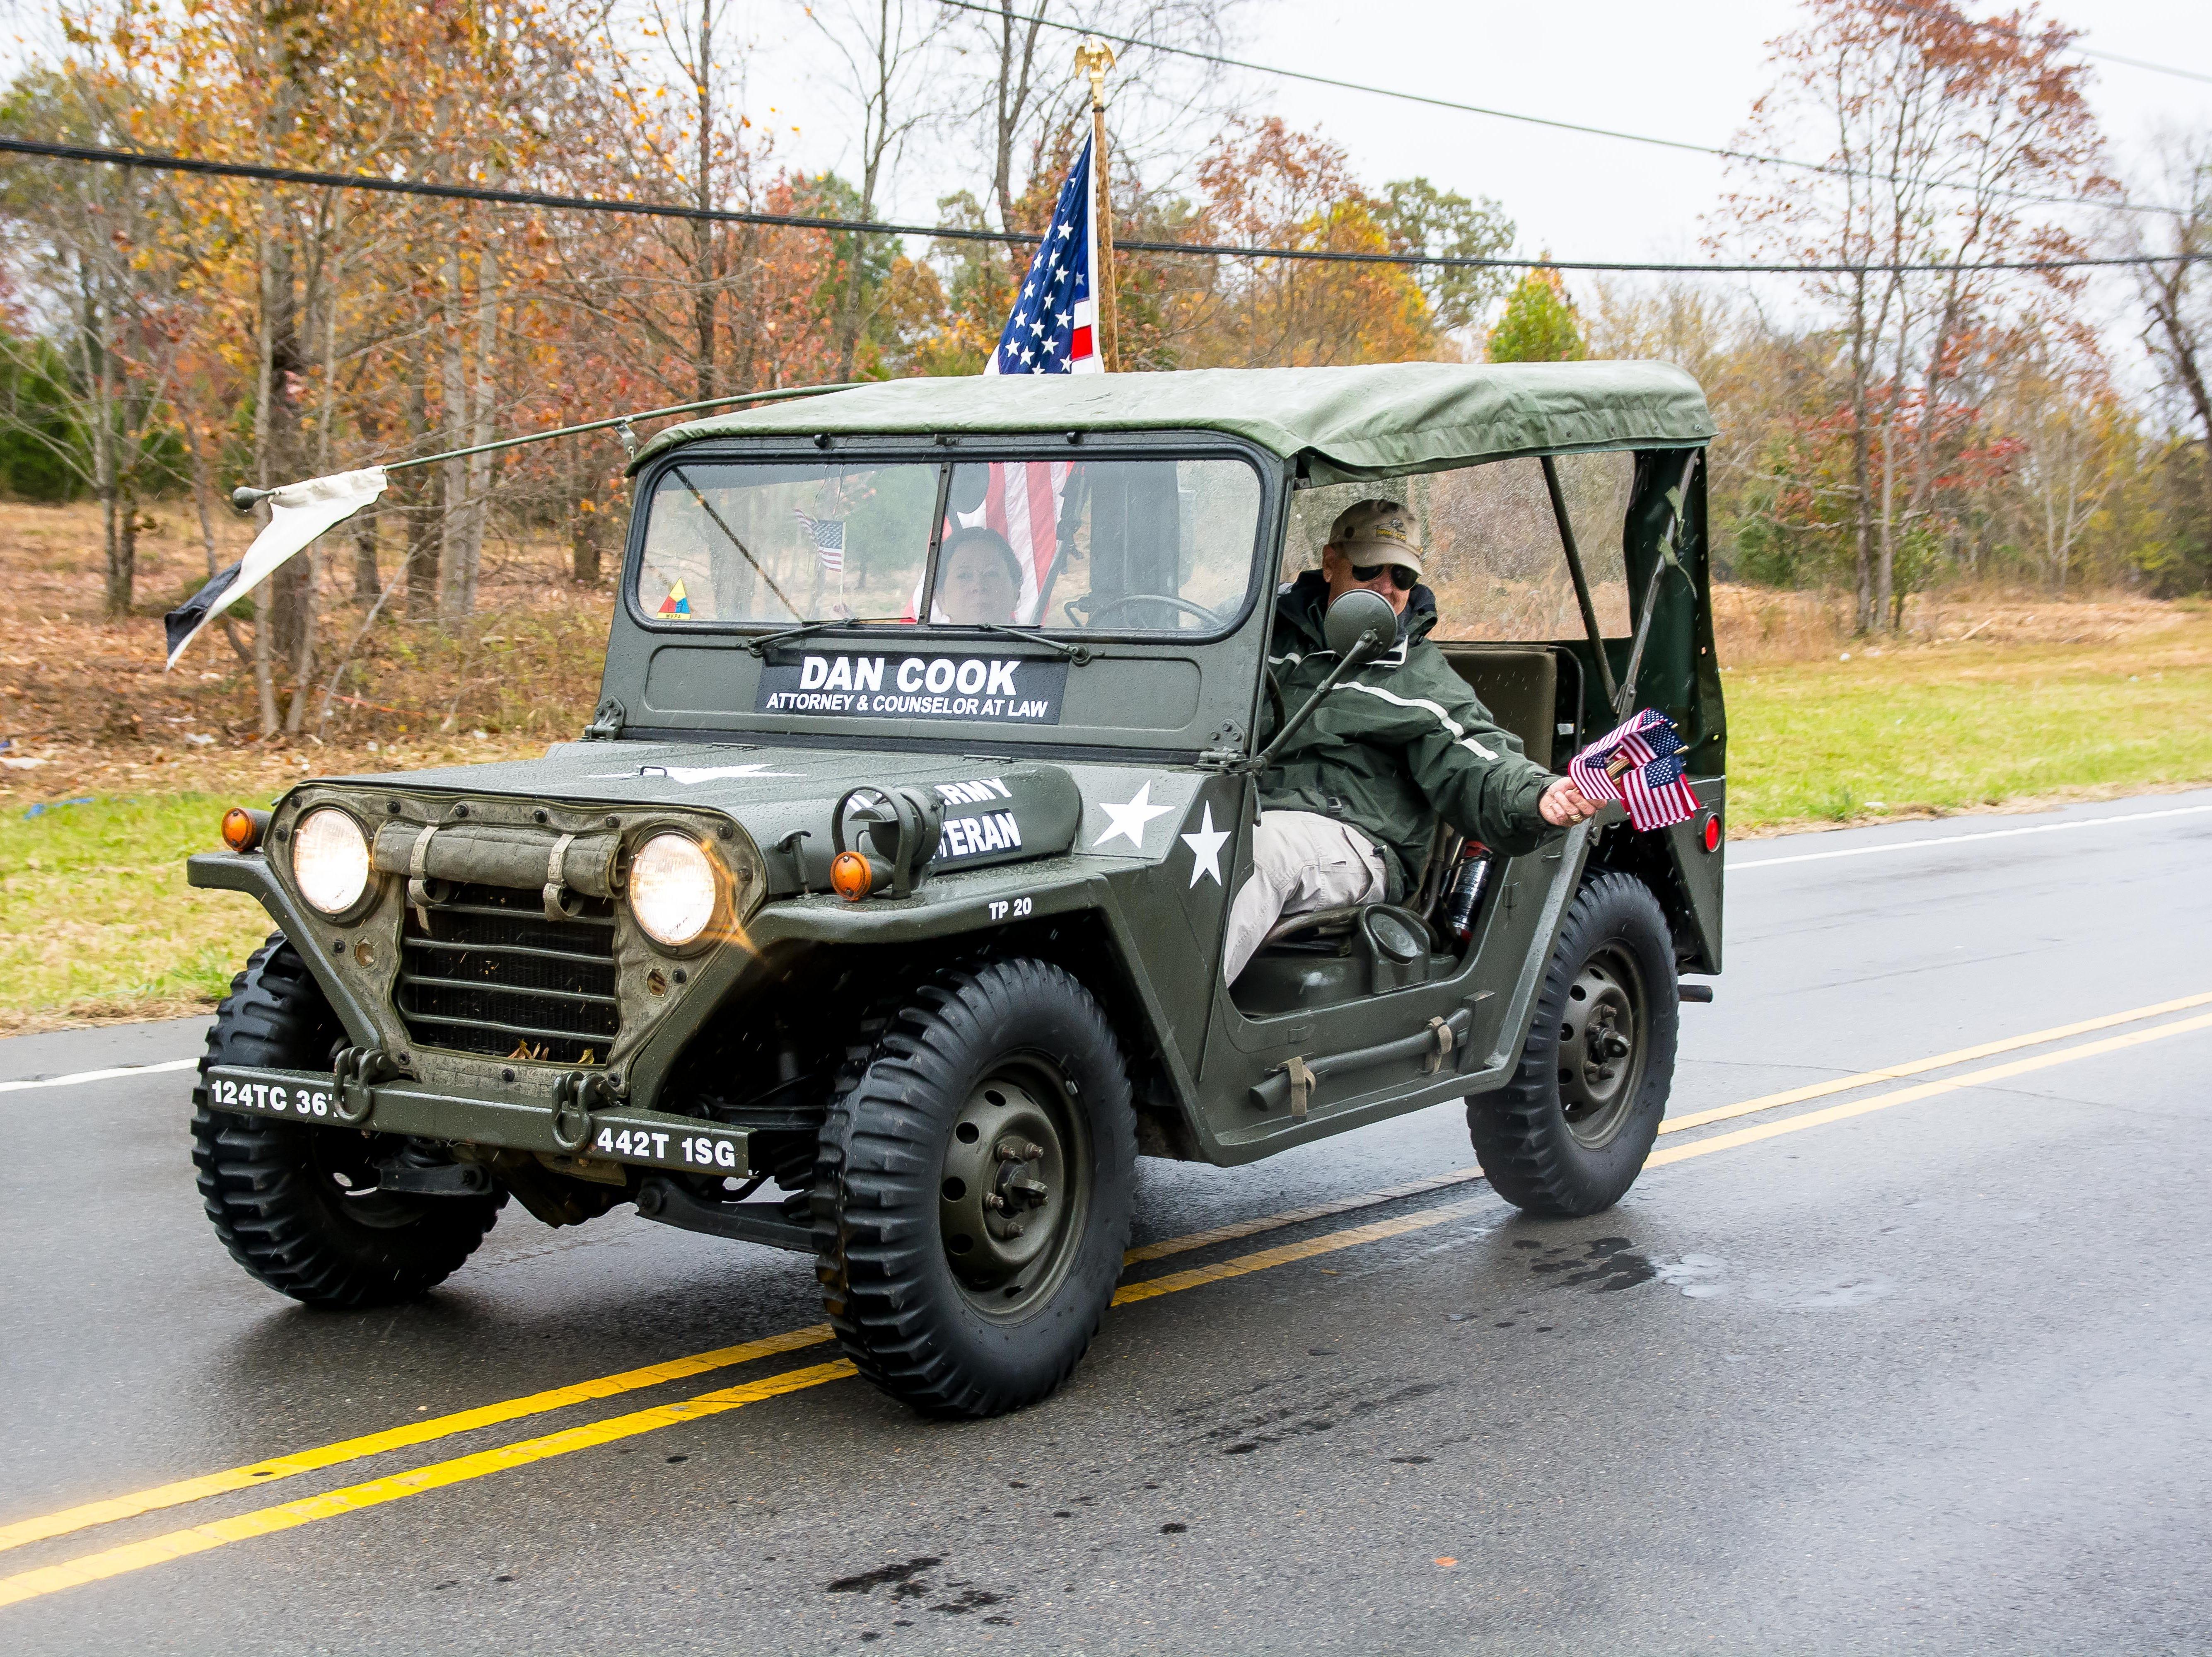 Scenes from the Cheatham County Veteran's Day Parade Day Parade on November 4, 2018.